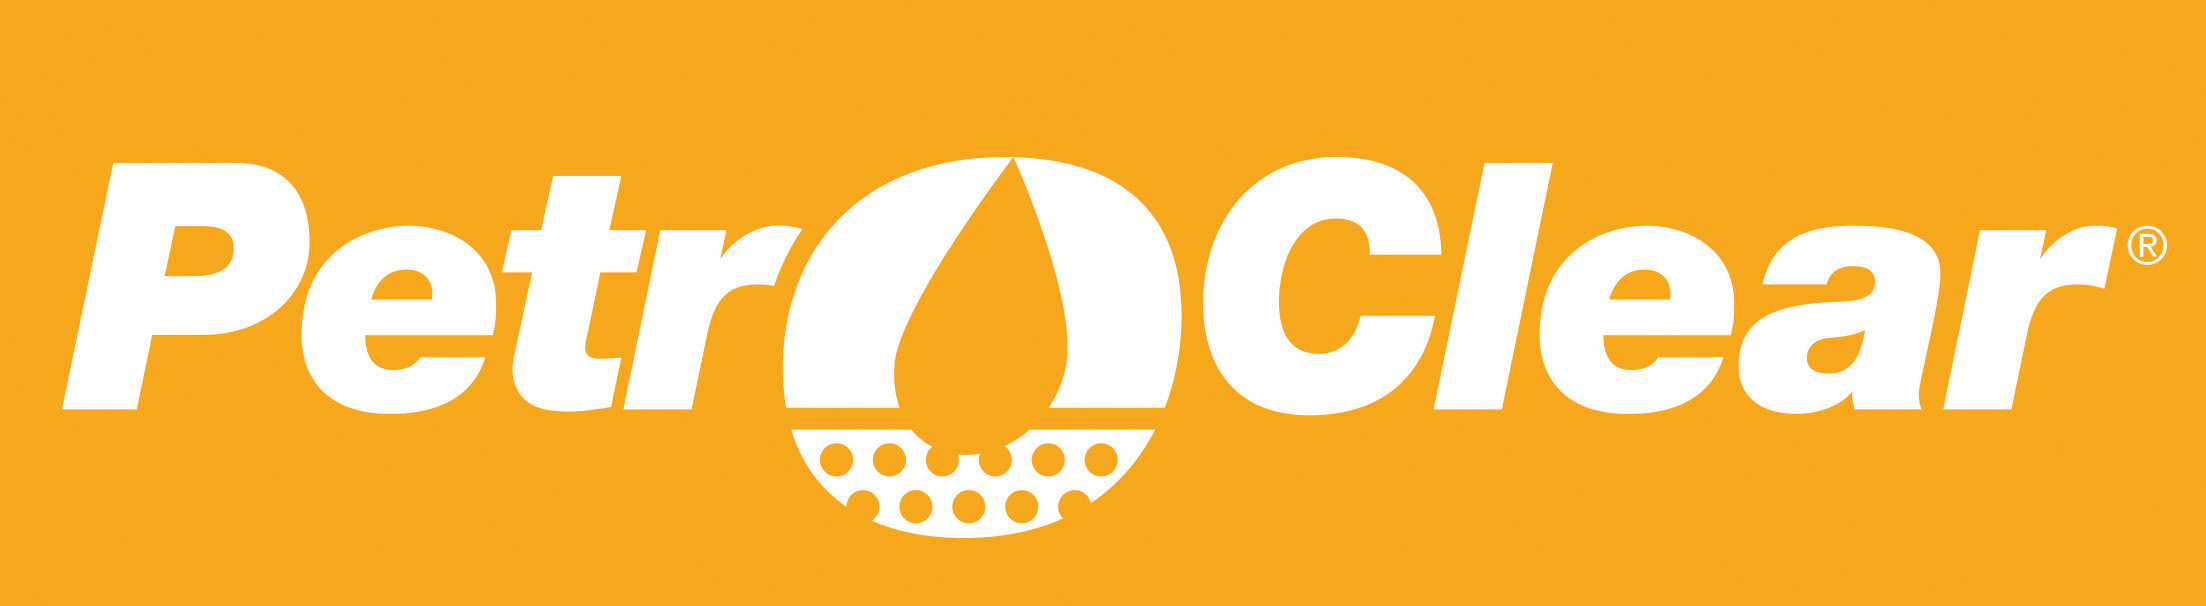 PetroClear White Logo on Yellow